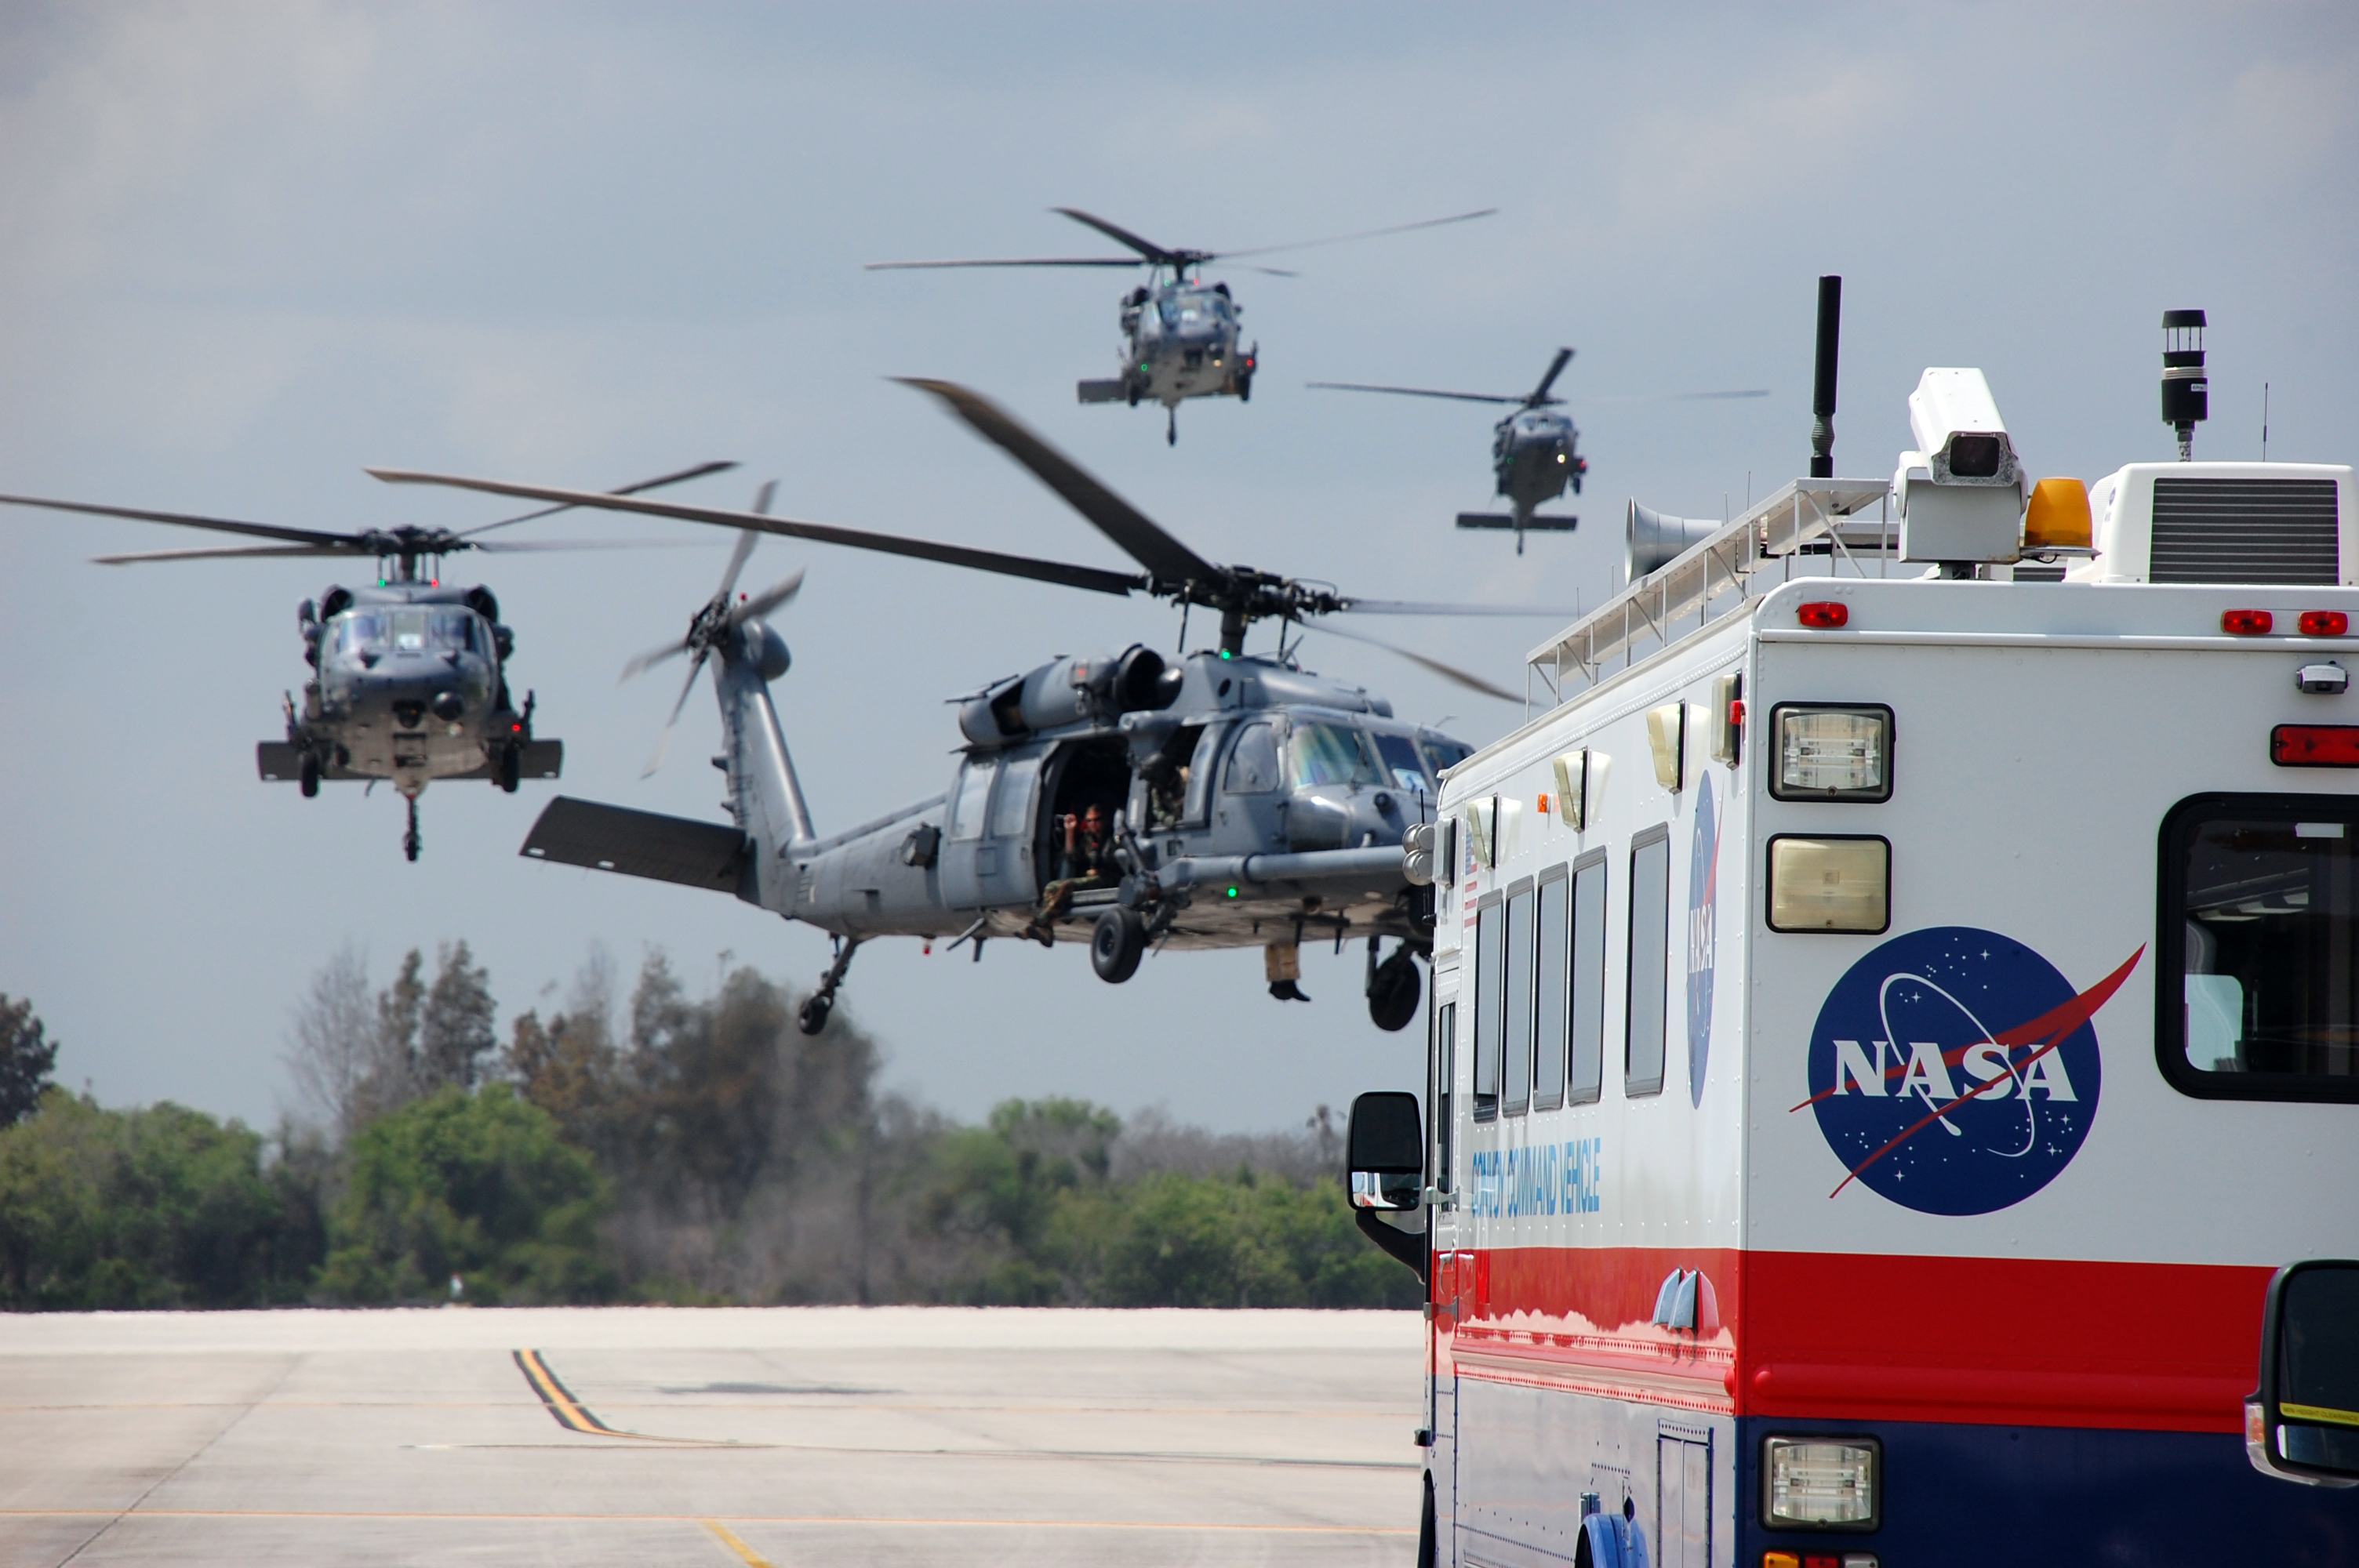 space shuttle emergency landing runways - photo #16